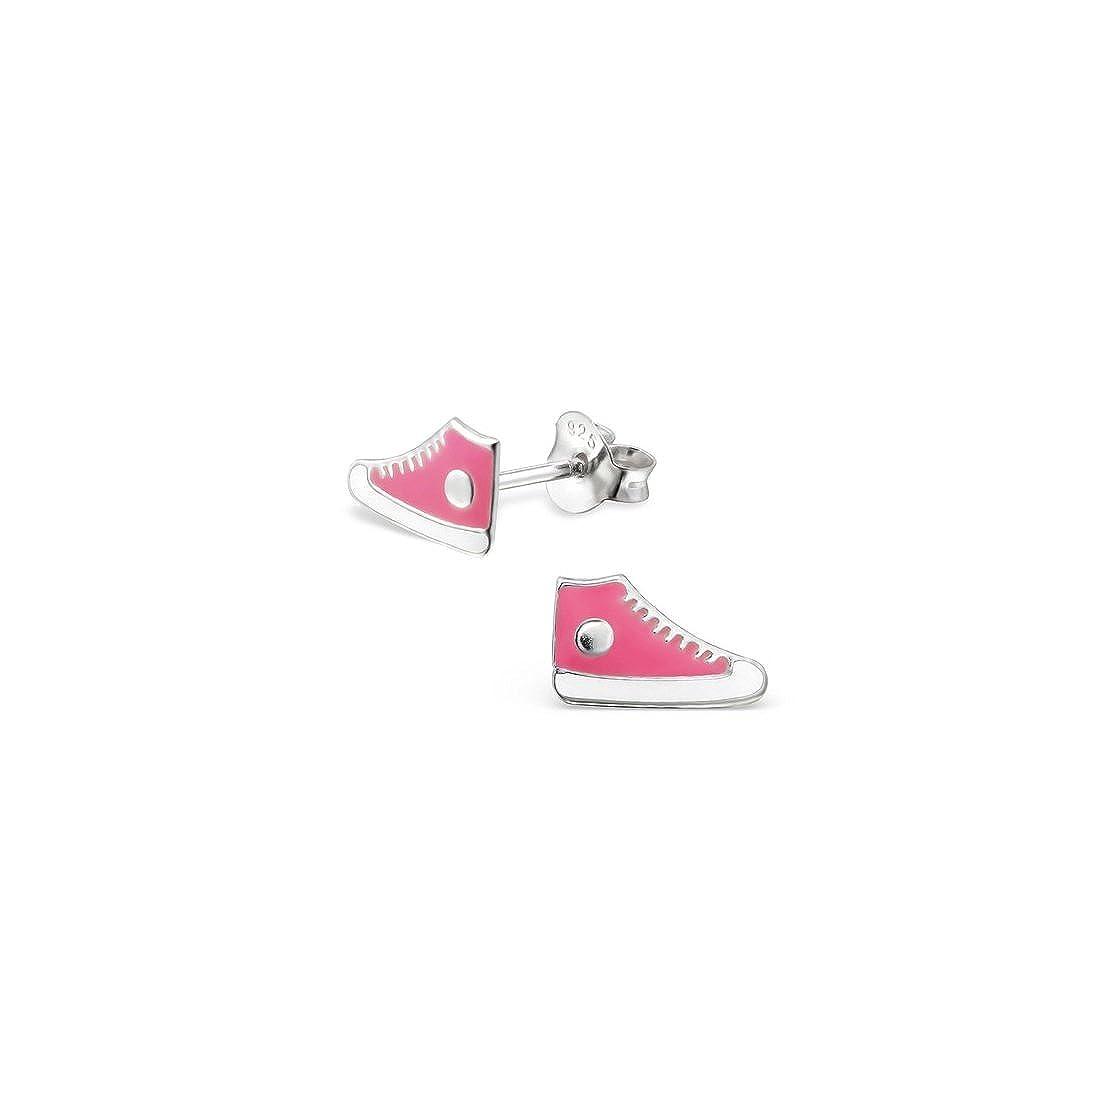 Girls Sneaker Colorful Ear Studs 925 Sterling Silver